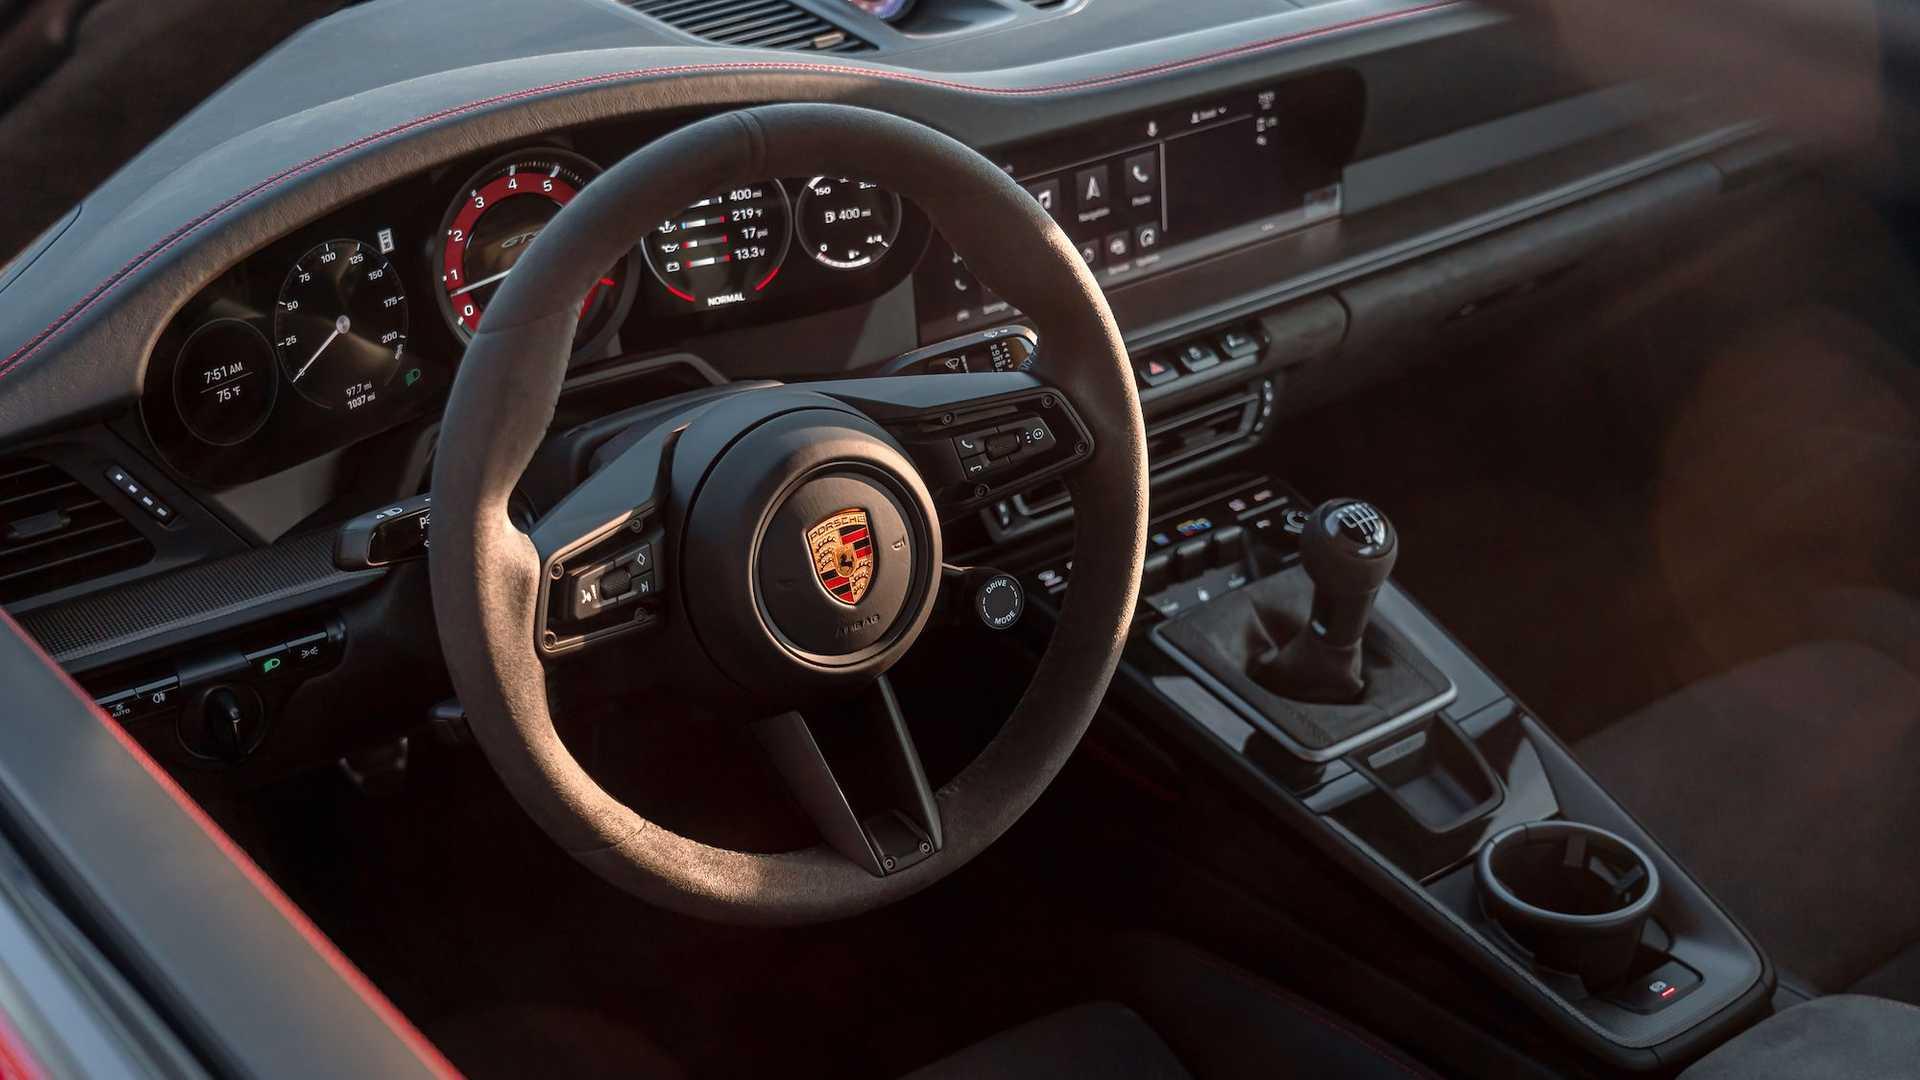 Porsche 911 utastere